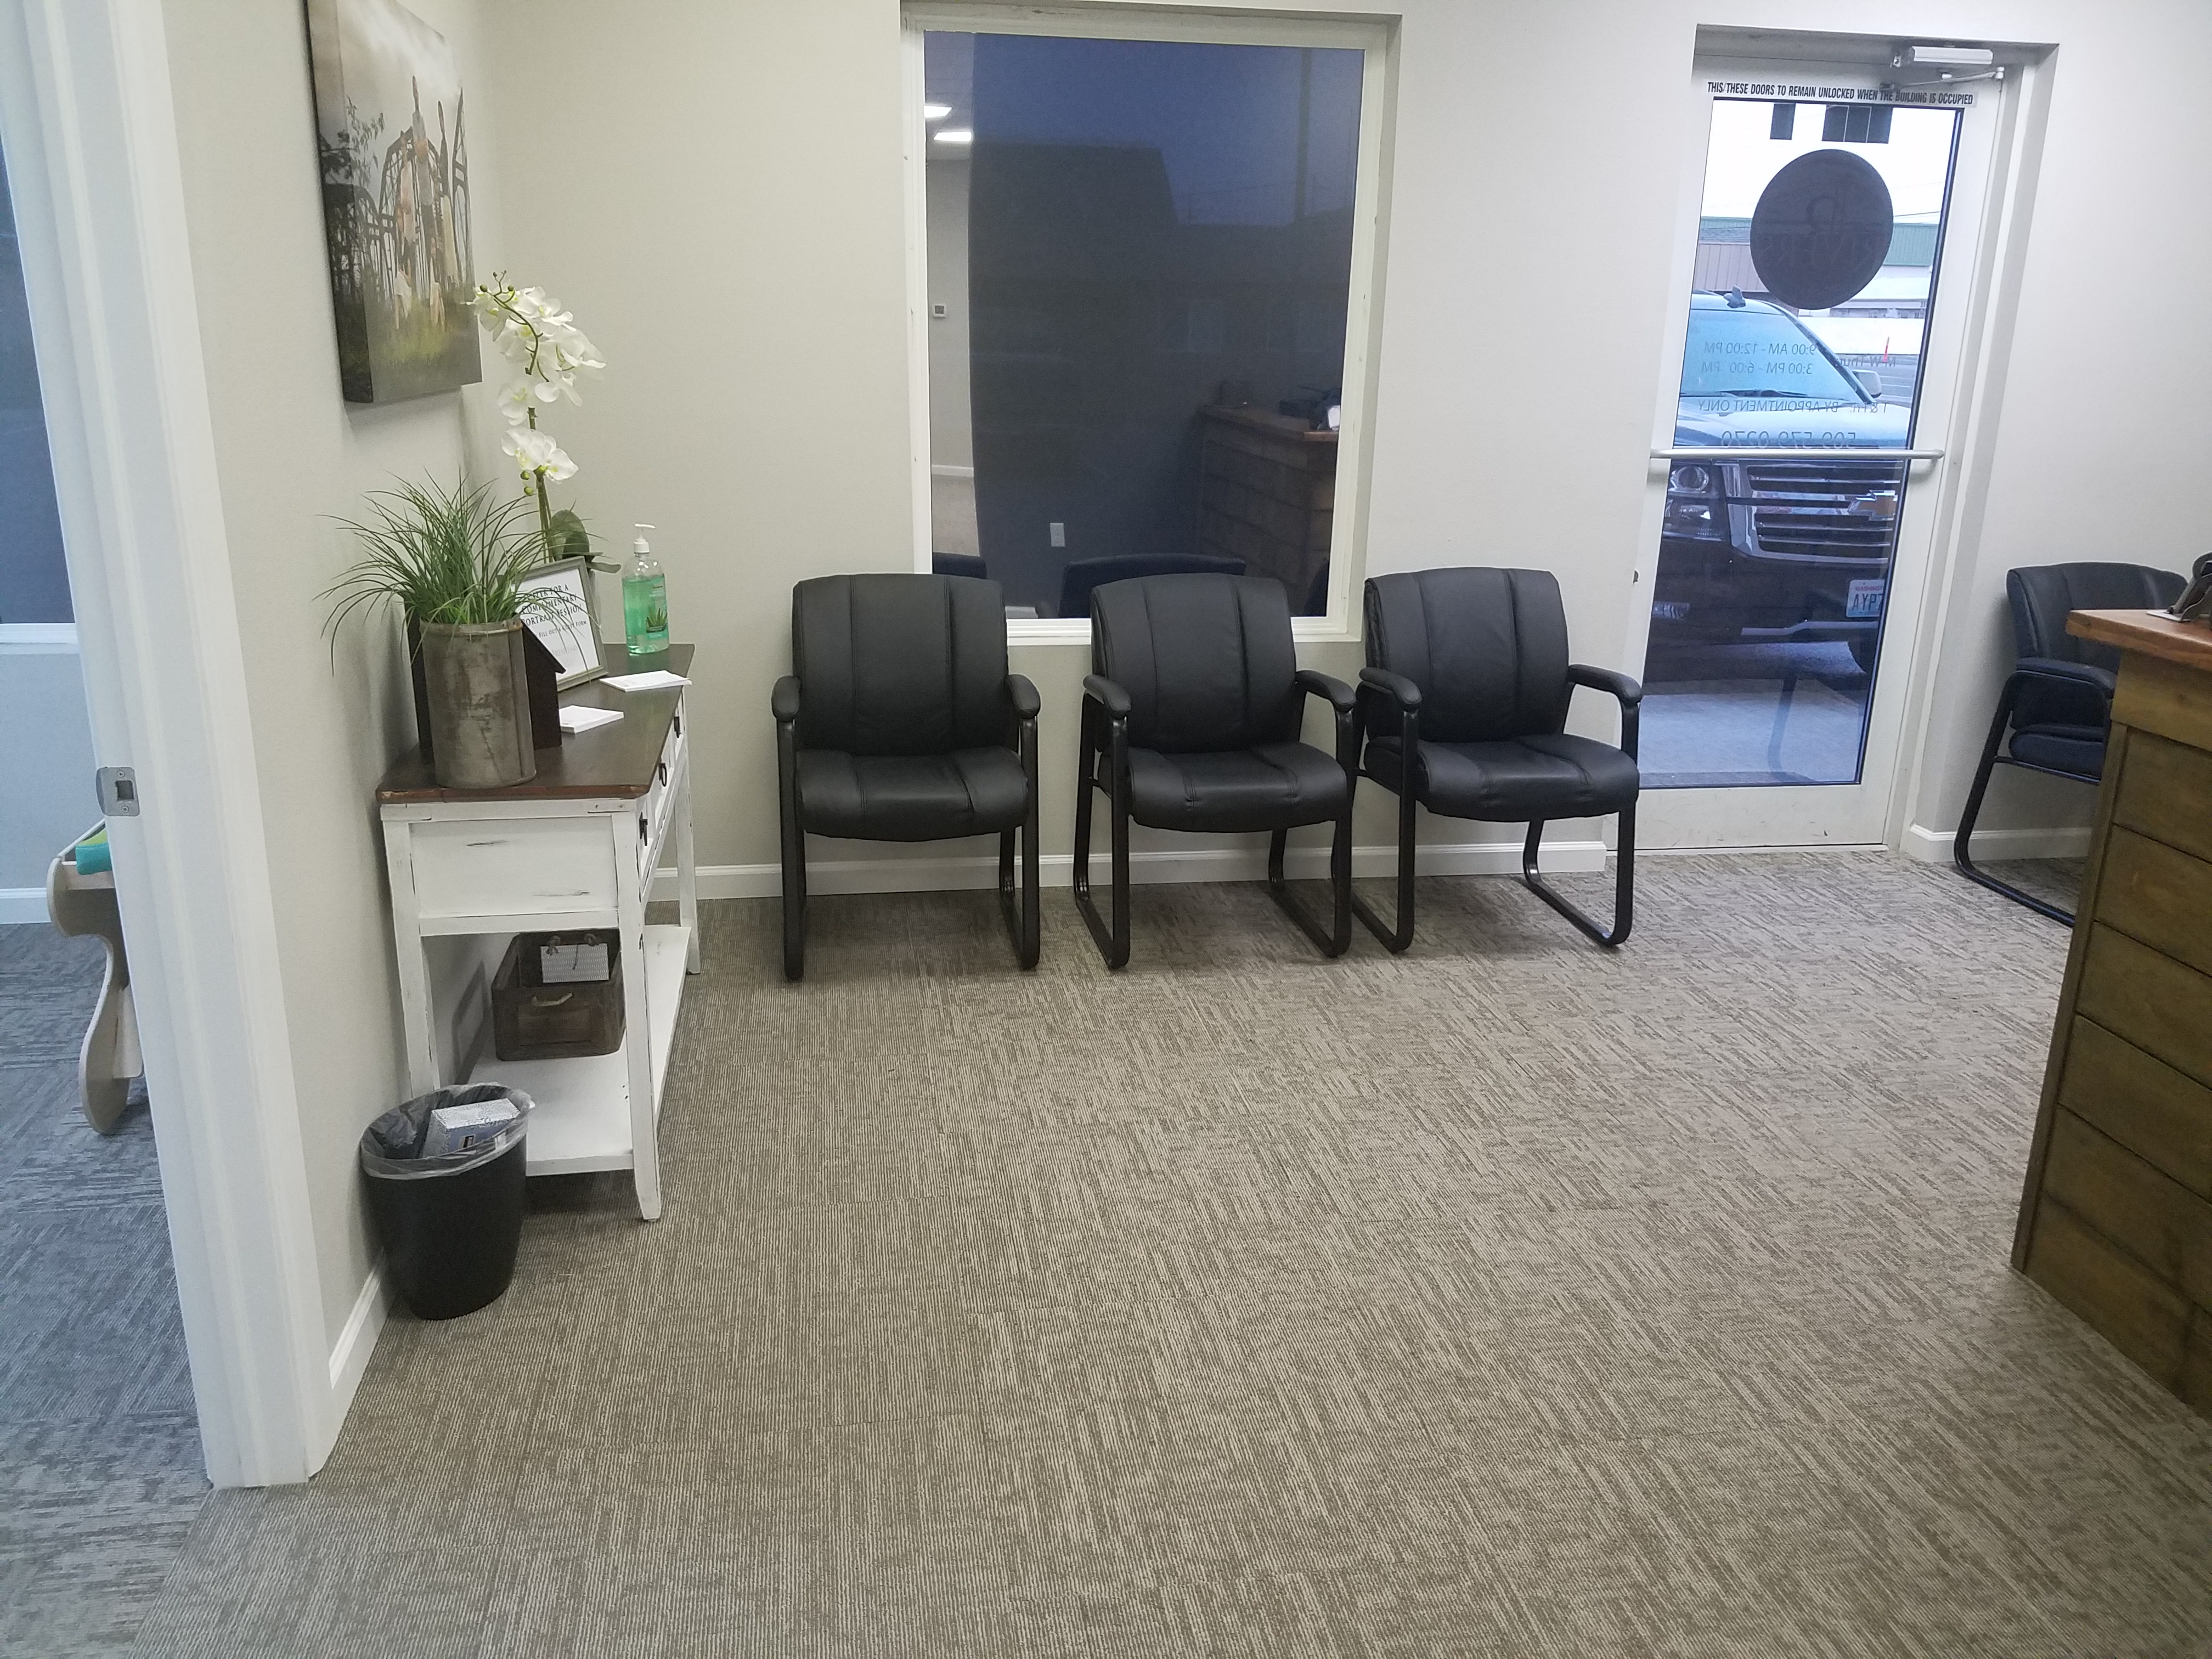 Kennewick Chiropractic Injury Clinic   4018 W Clearwater Ave Ste B, Kennewick, WA, 99336   +1 (509) 596-1288